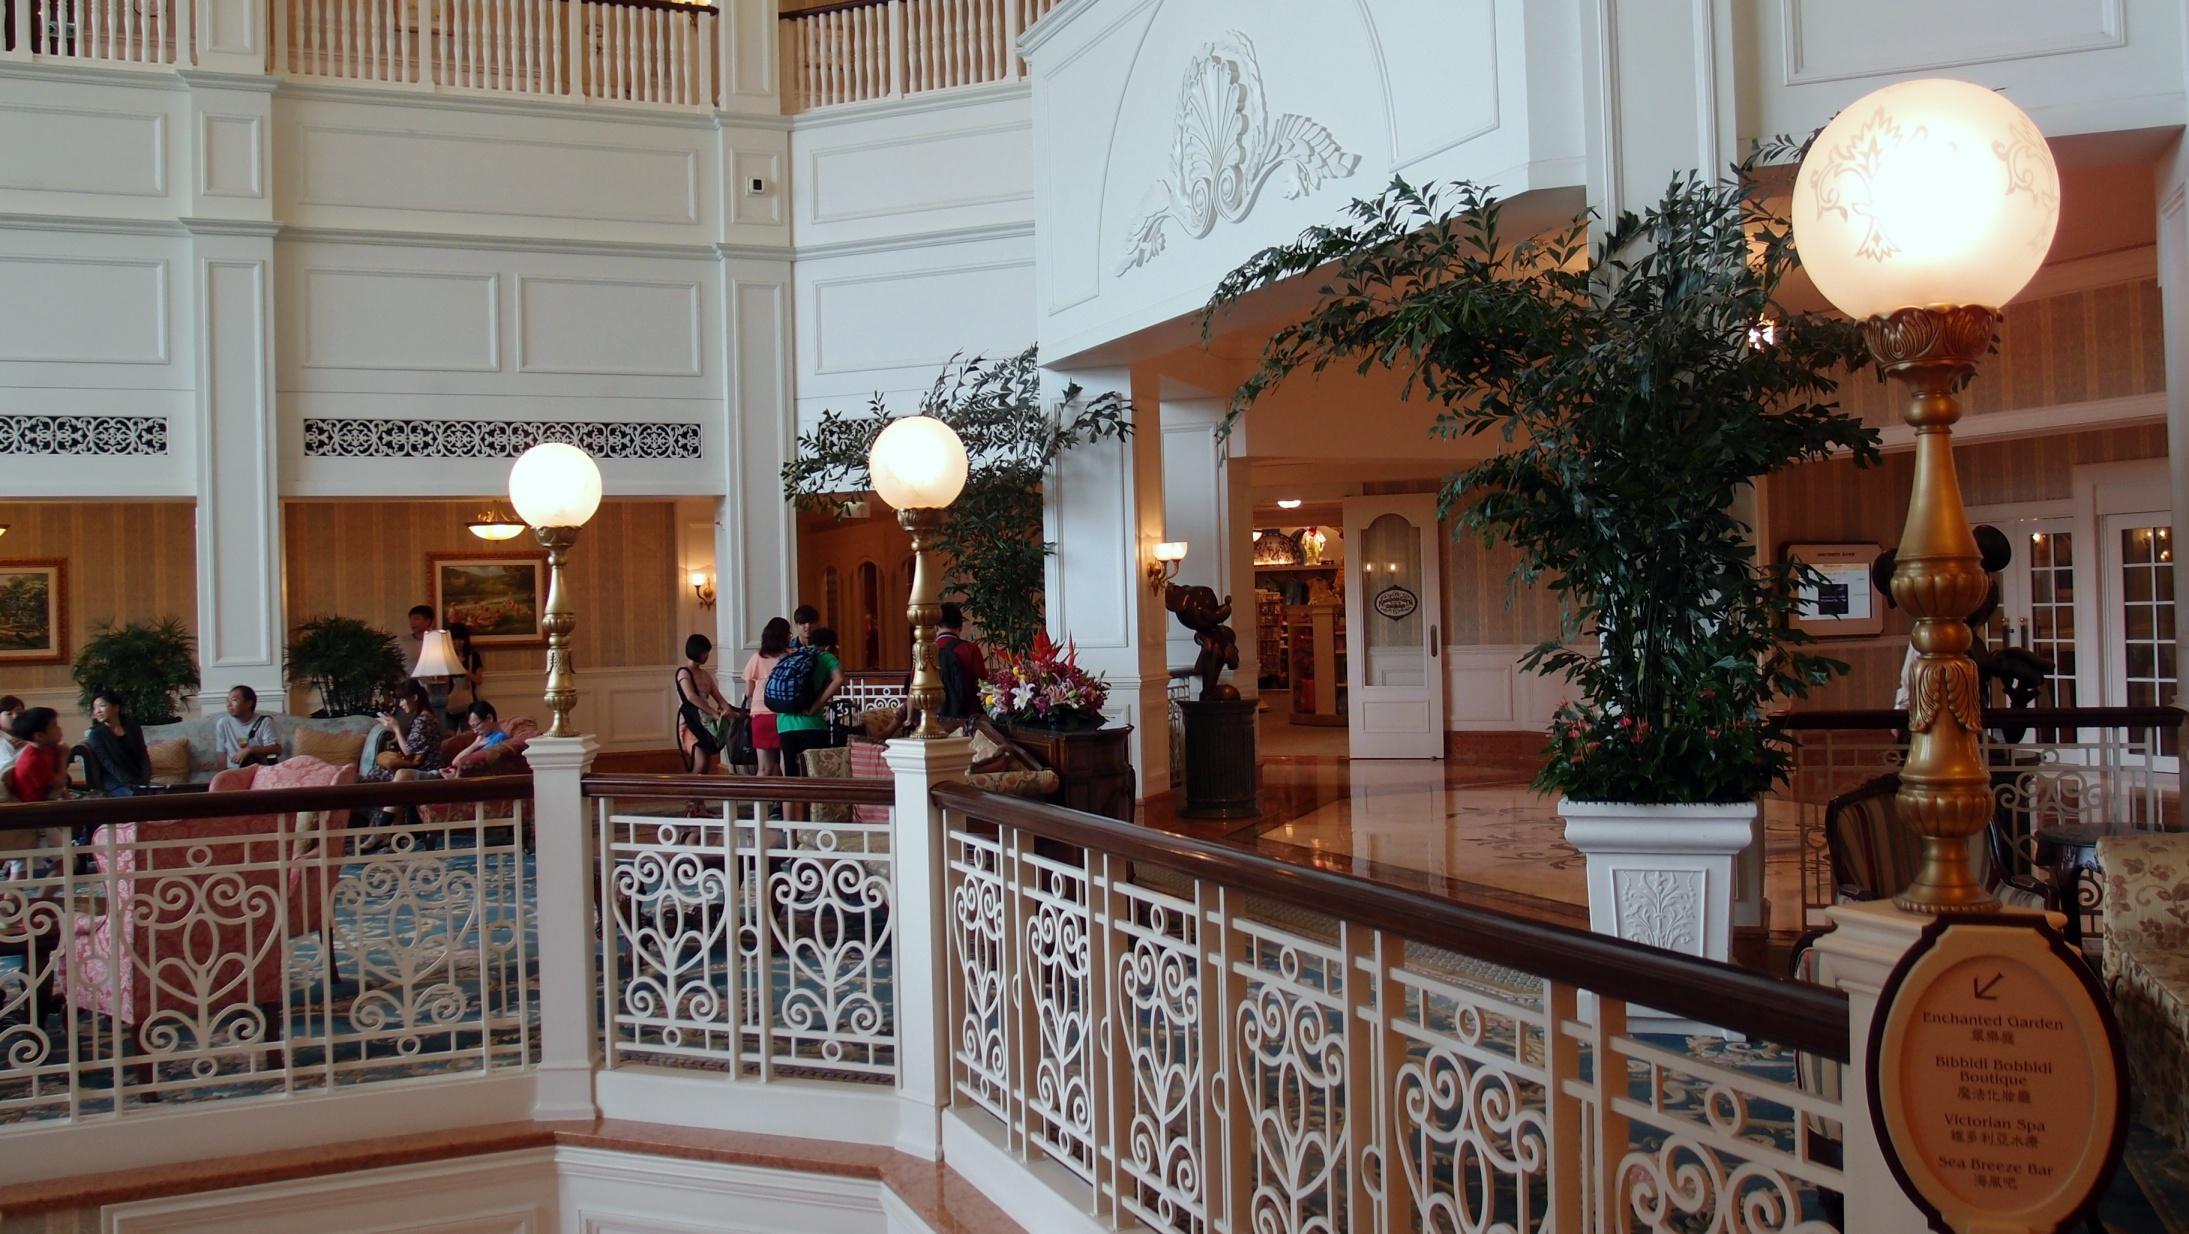 The interior of the Disneyland Hotel